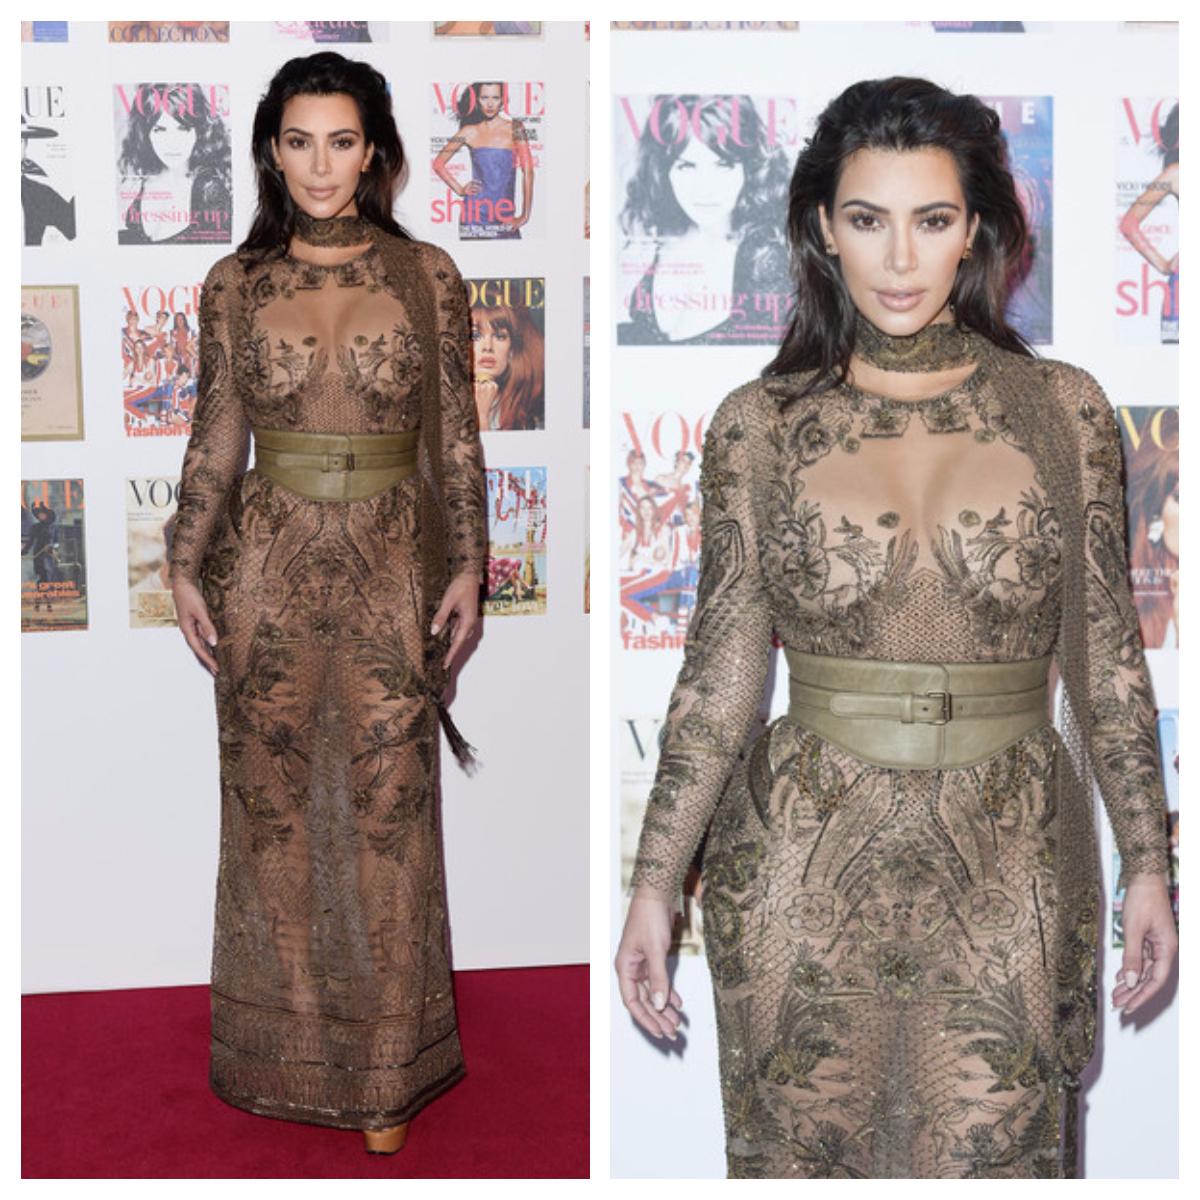 Top 10 des pires looks de Kim Kardashian